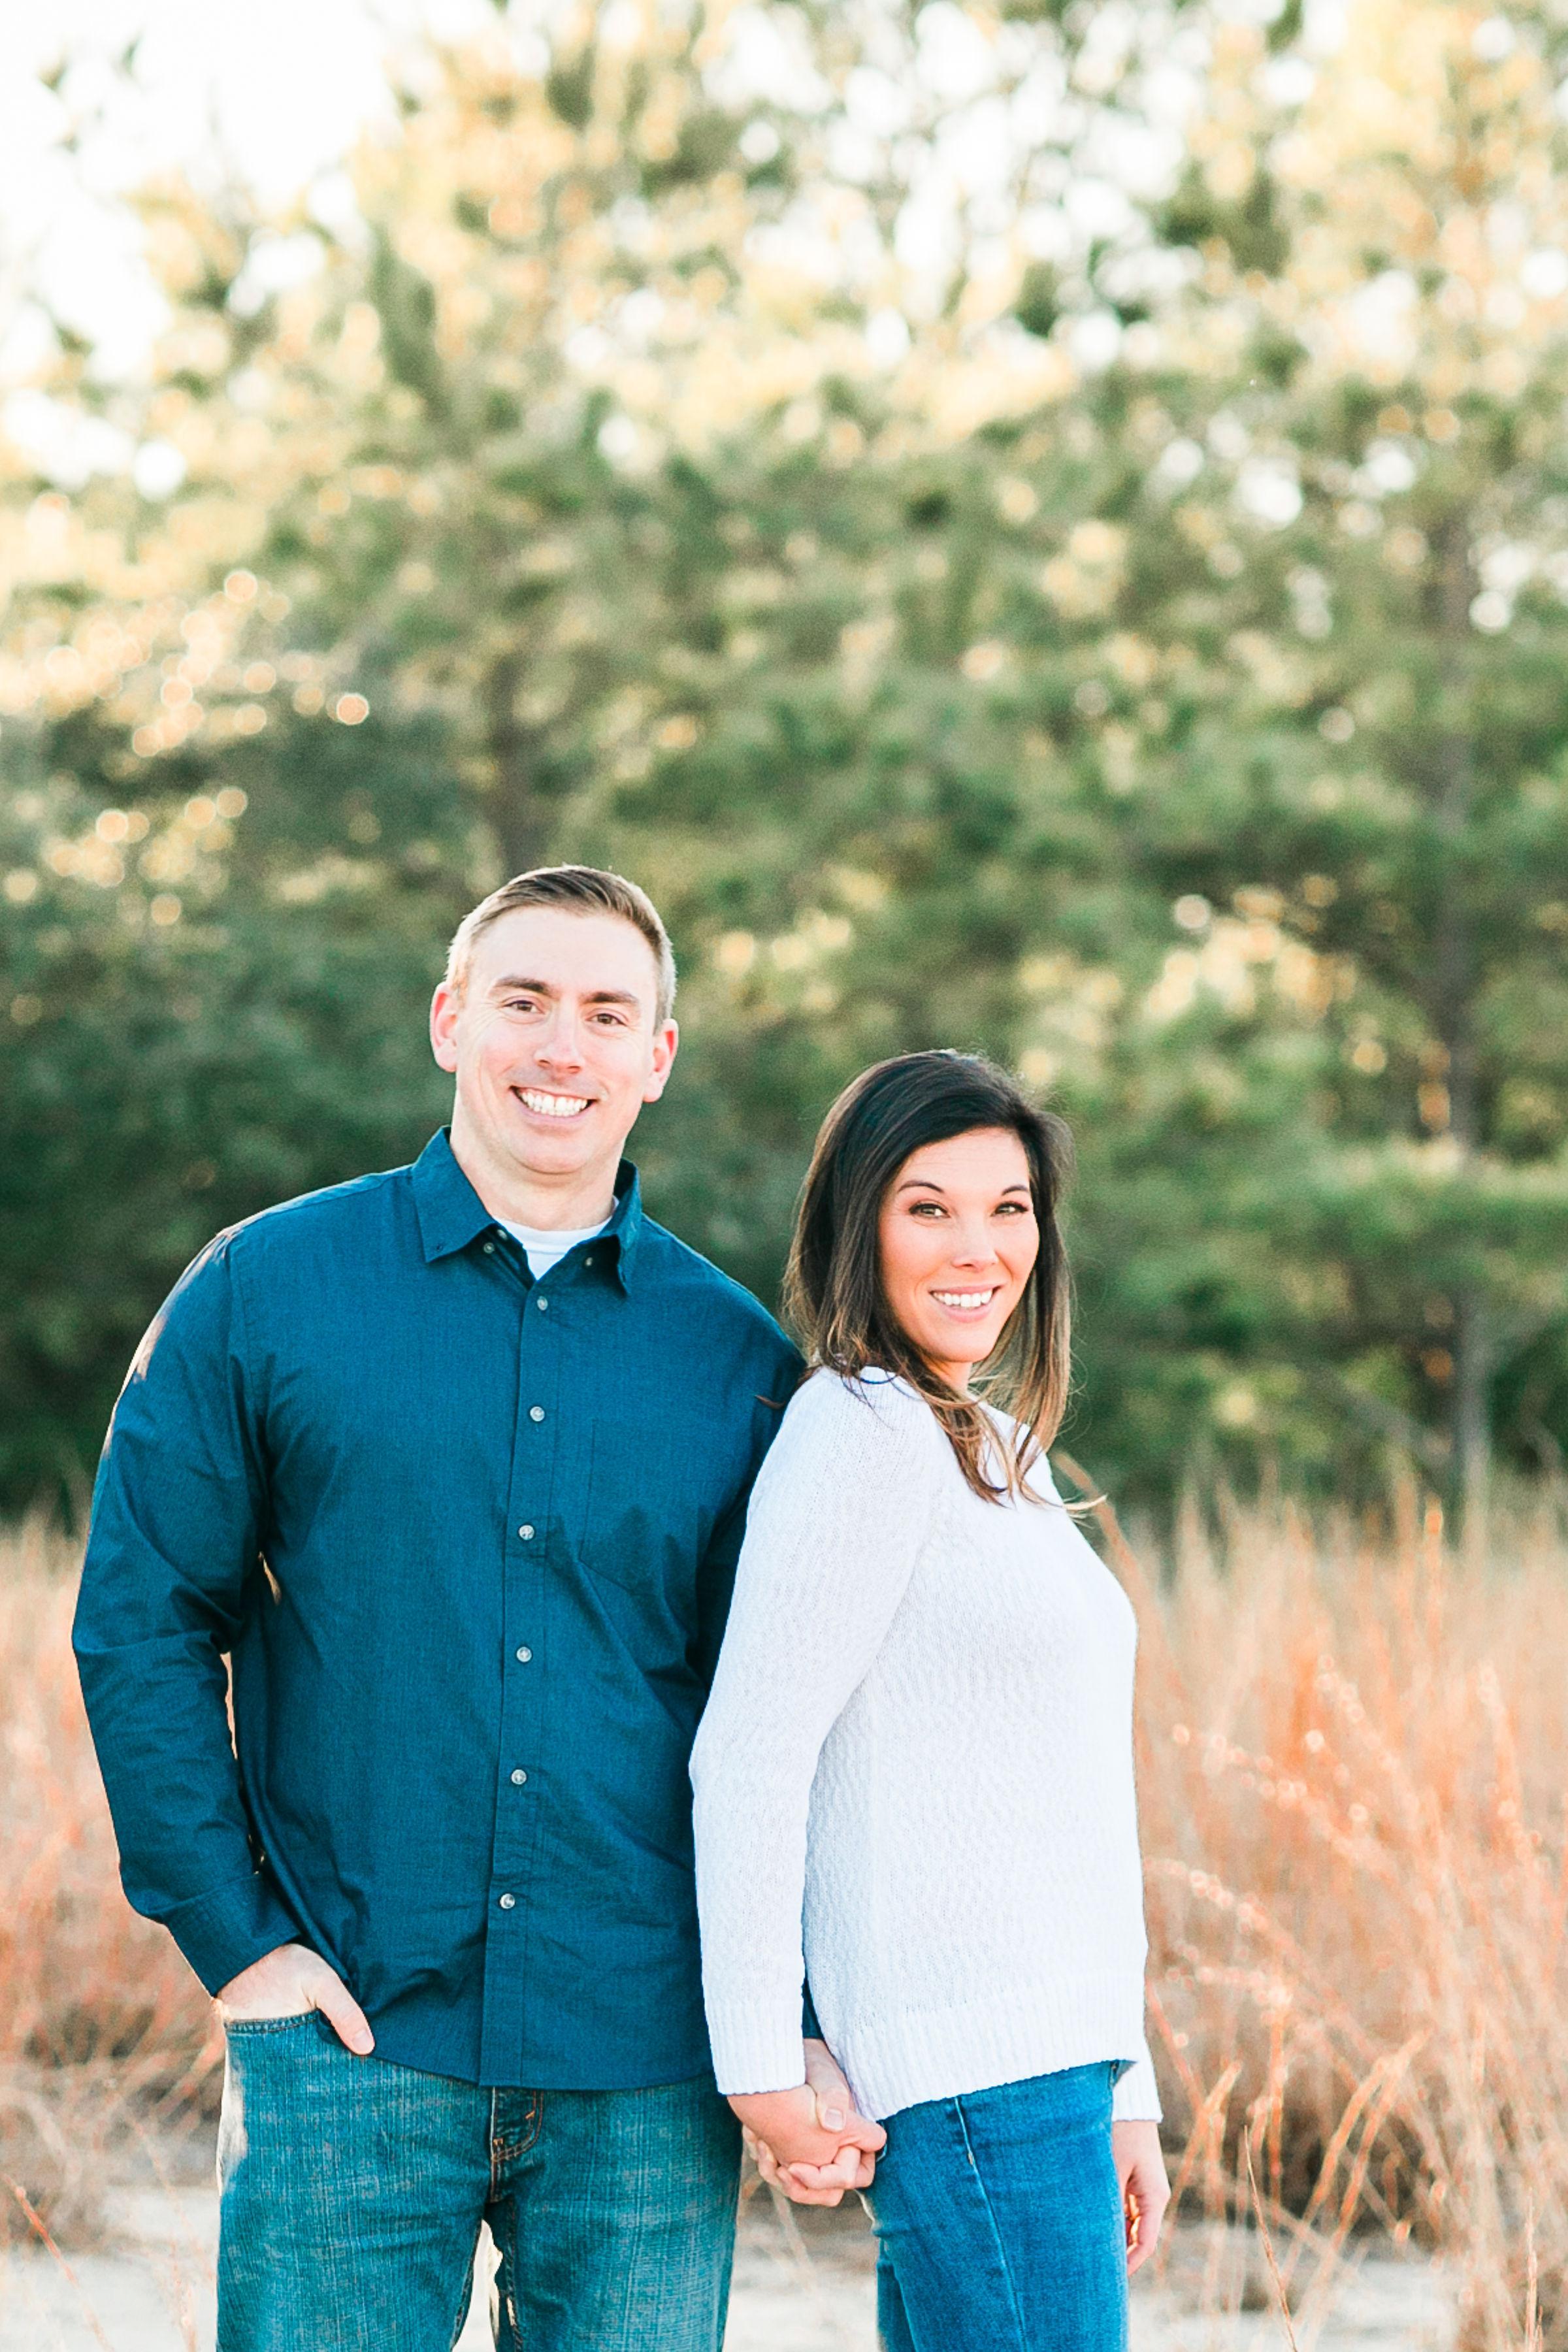 Nicole&Dustin_Engaged-159.jpg